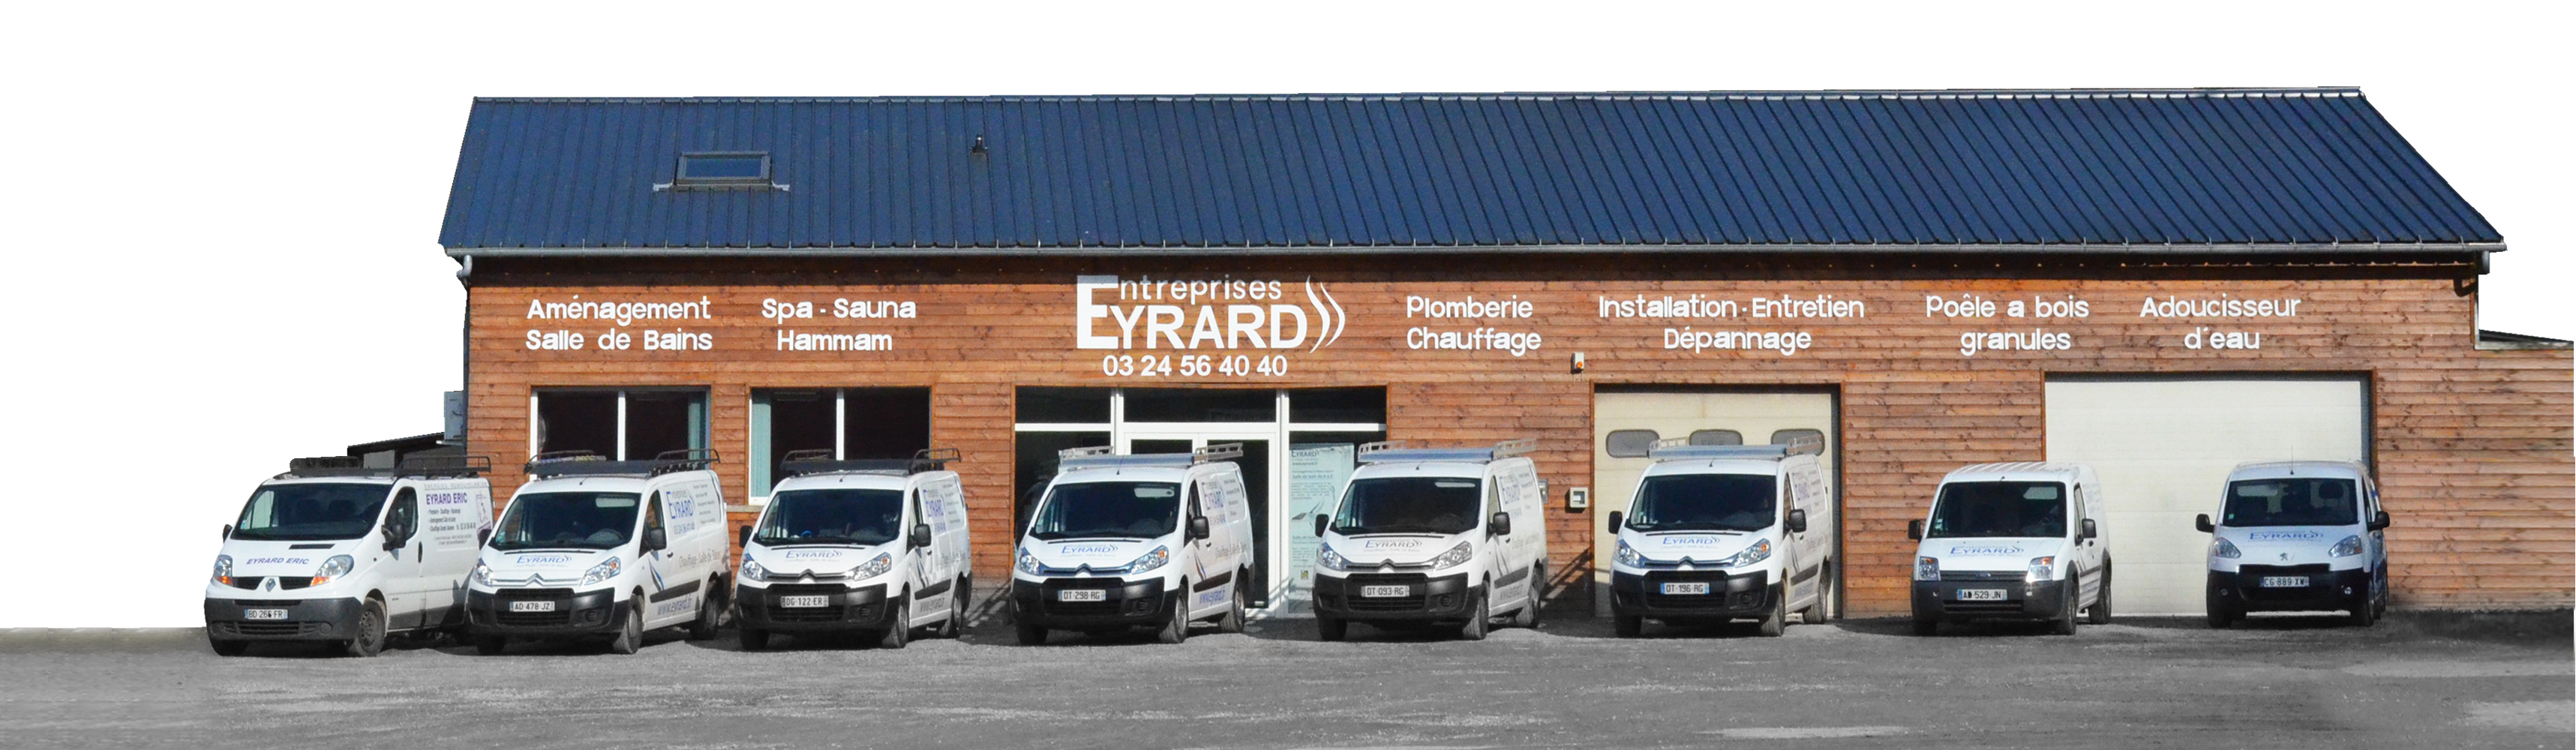 Entreprise Eyrard, enseigne et véhicules